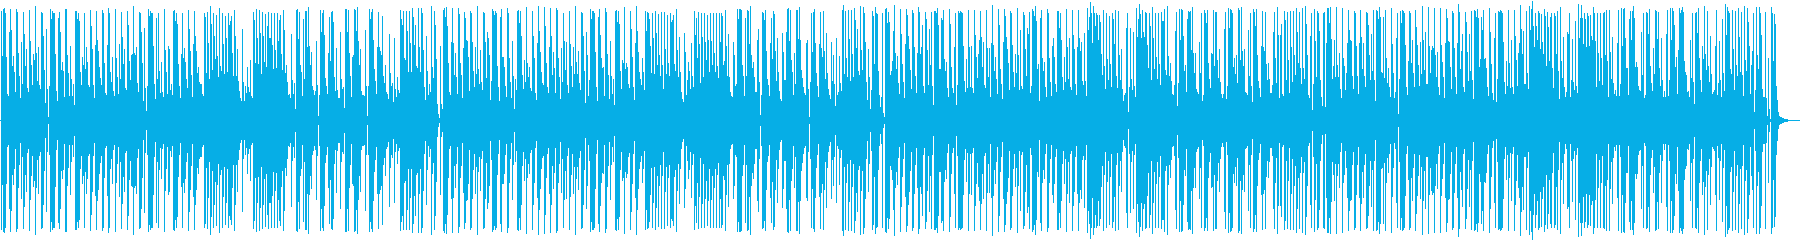 YouTube アコギ・木琴・軽快の再生済みの波形